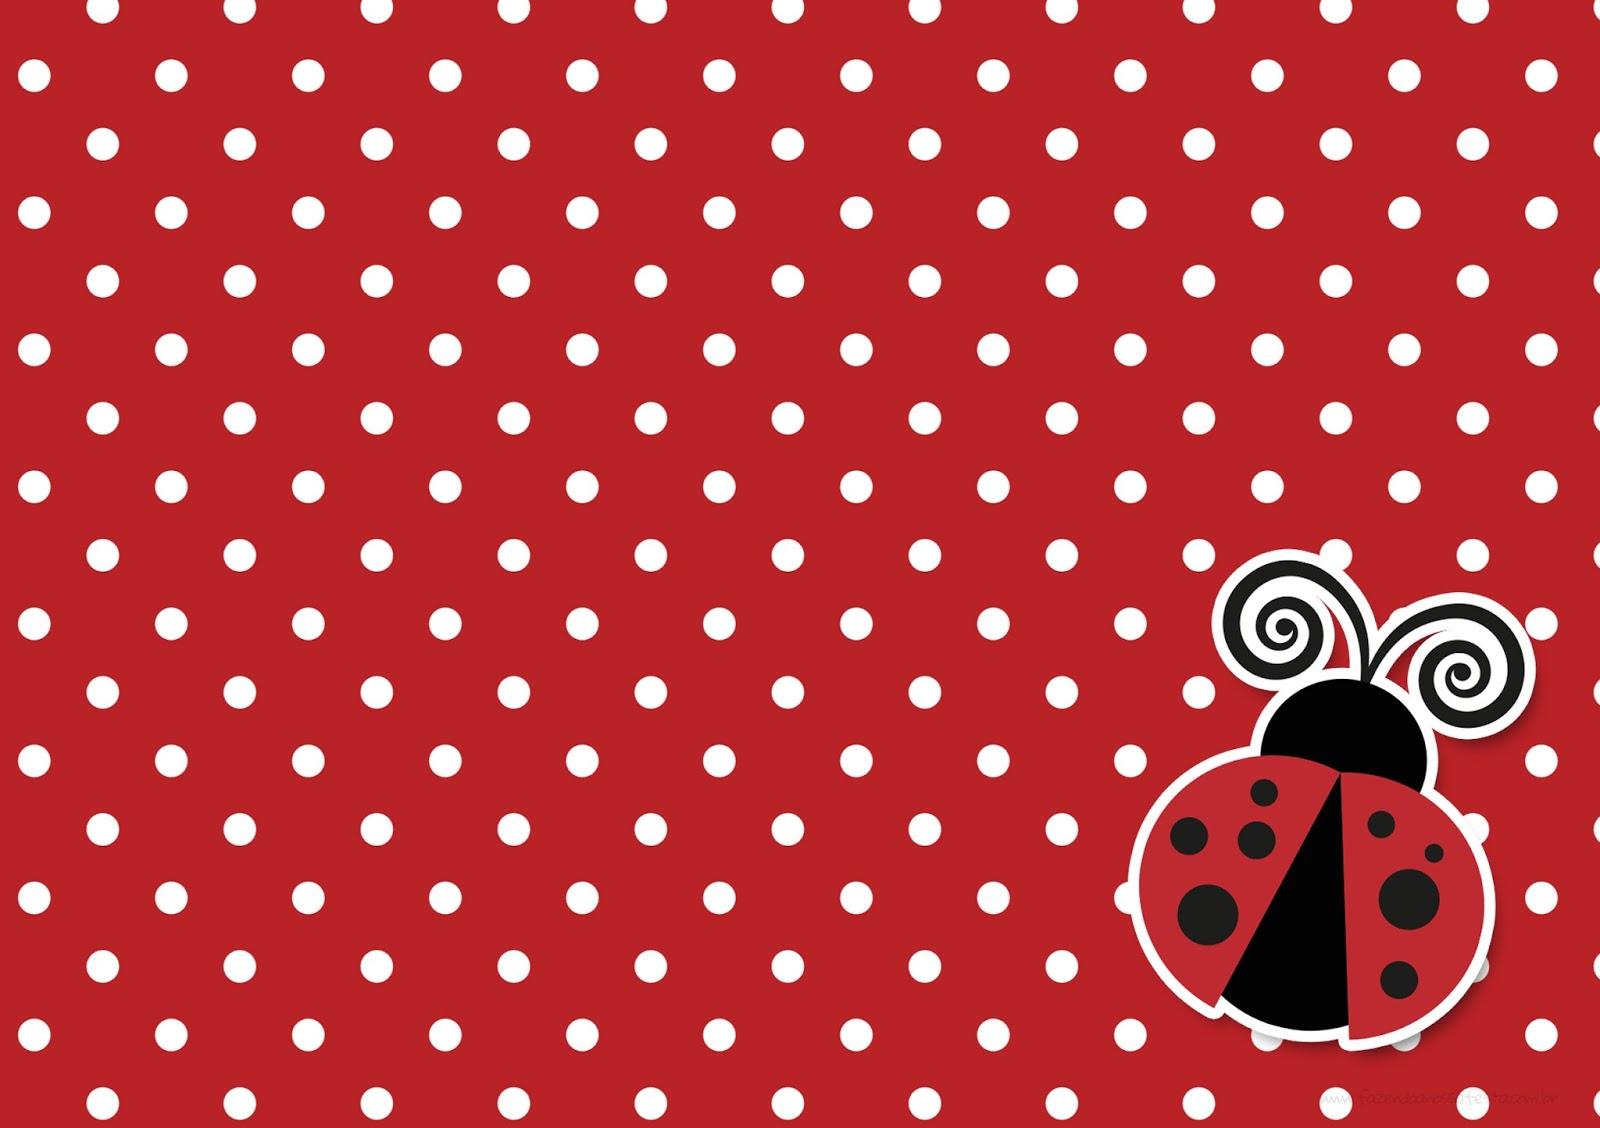 Ladybug Party Free Printable Invitations